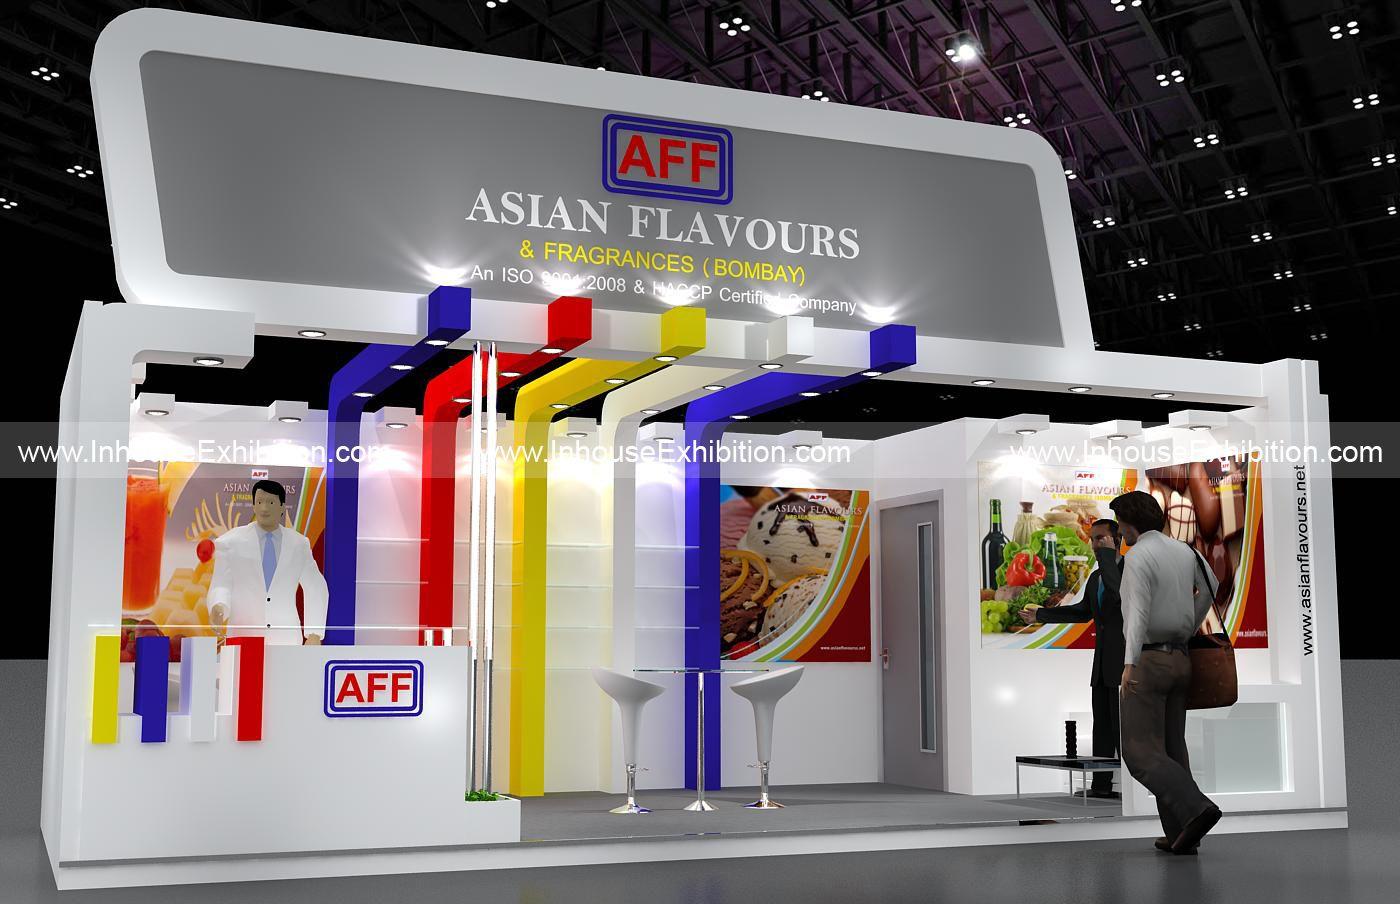 Exhibition Stand Company In Qatar : Inhouse exhibition